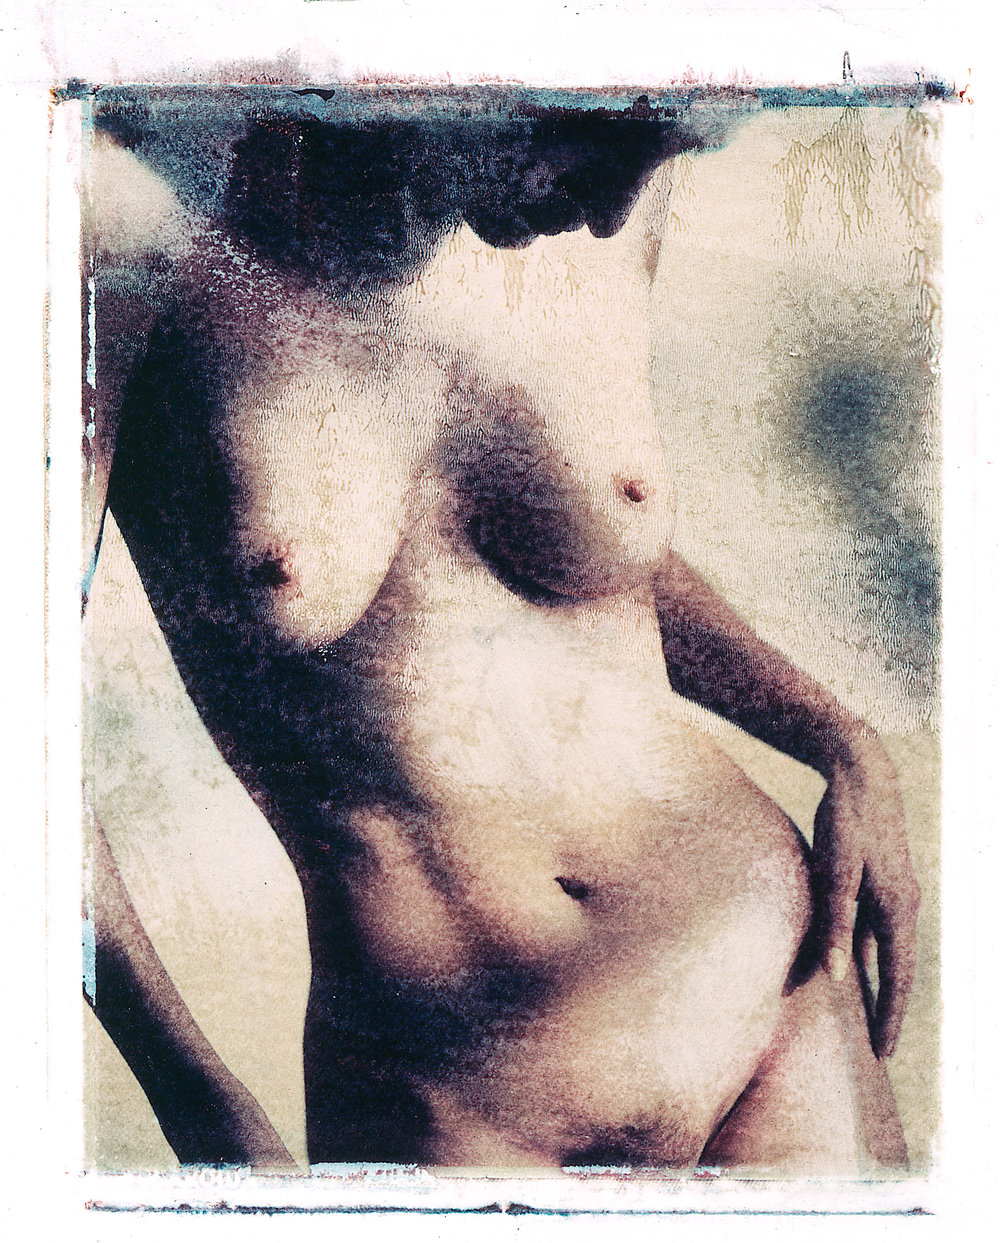 Studio Portrait Fotografie, Polaroids, Nude, Peoplefotografie, Porträtfotografie, Zürich, Schweiz